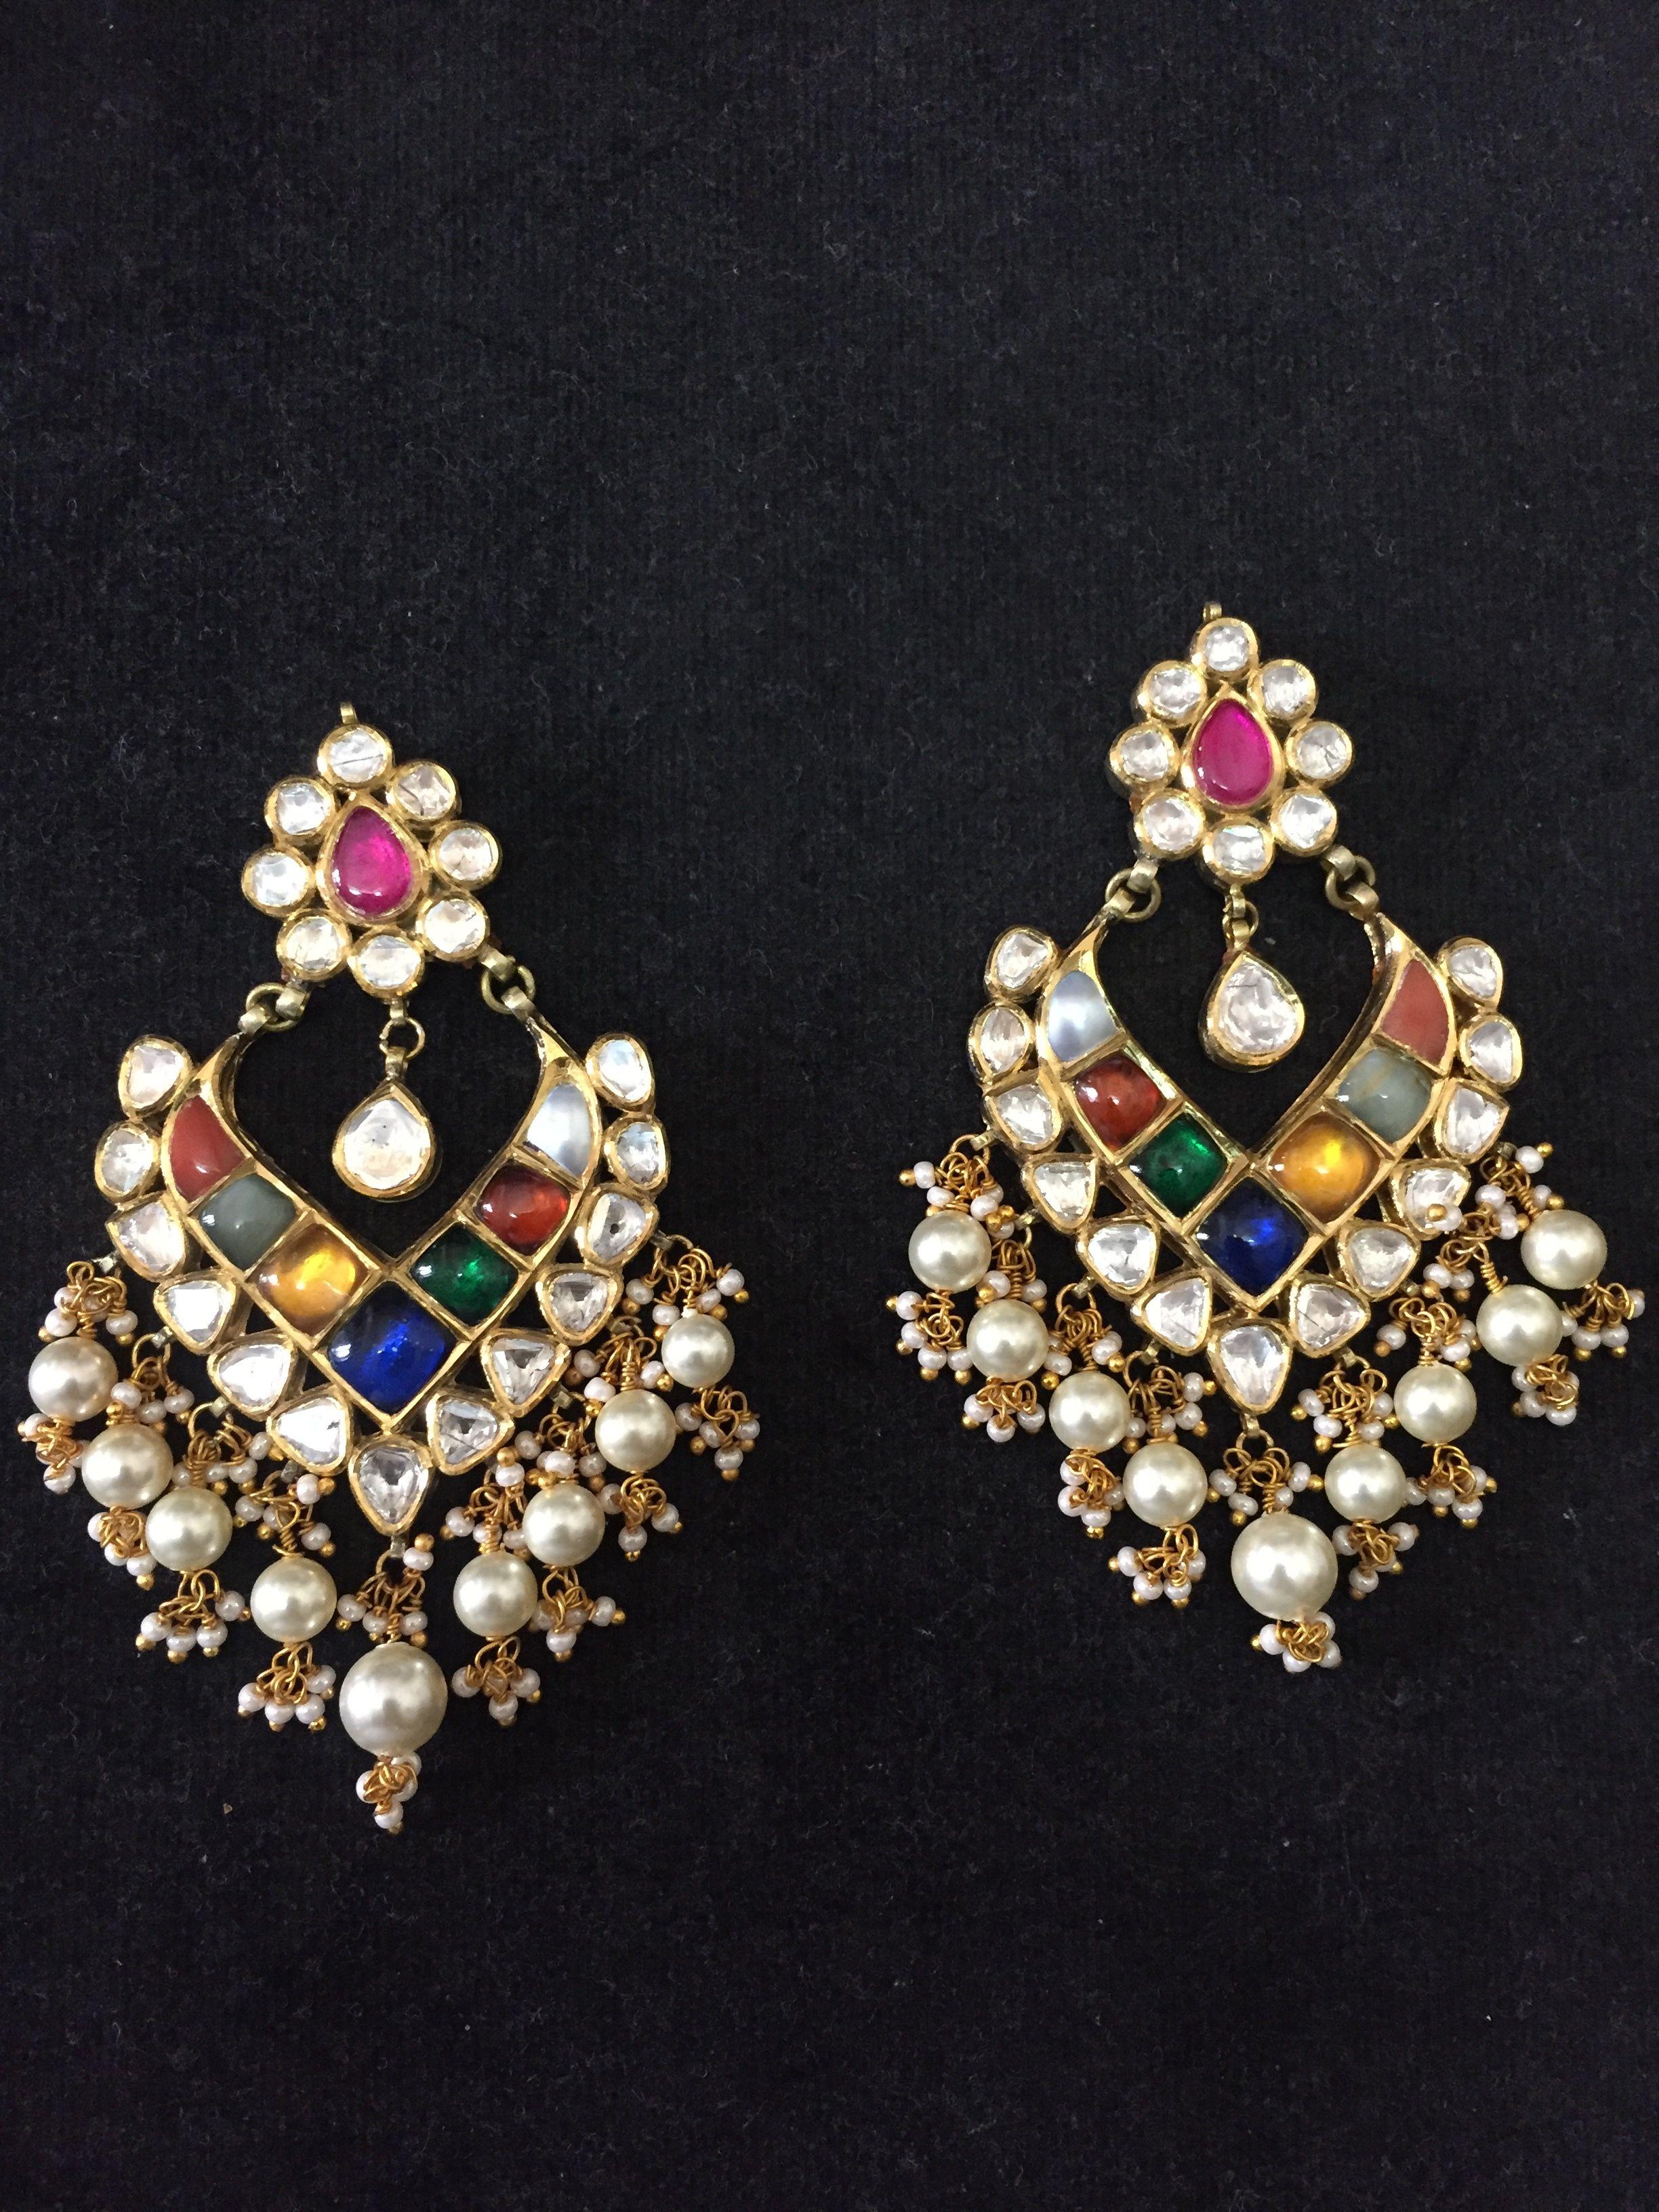 Nav ratan chand bali jewellery pinterest indian jewelry and classy